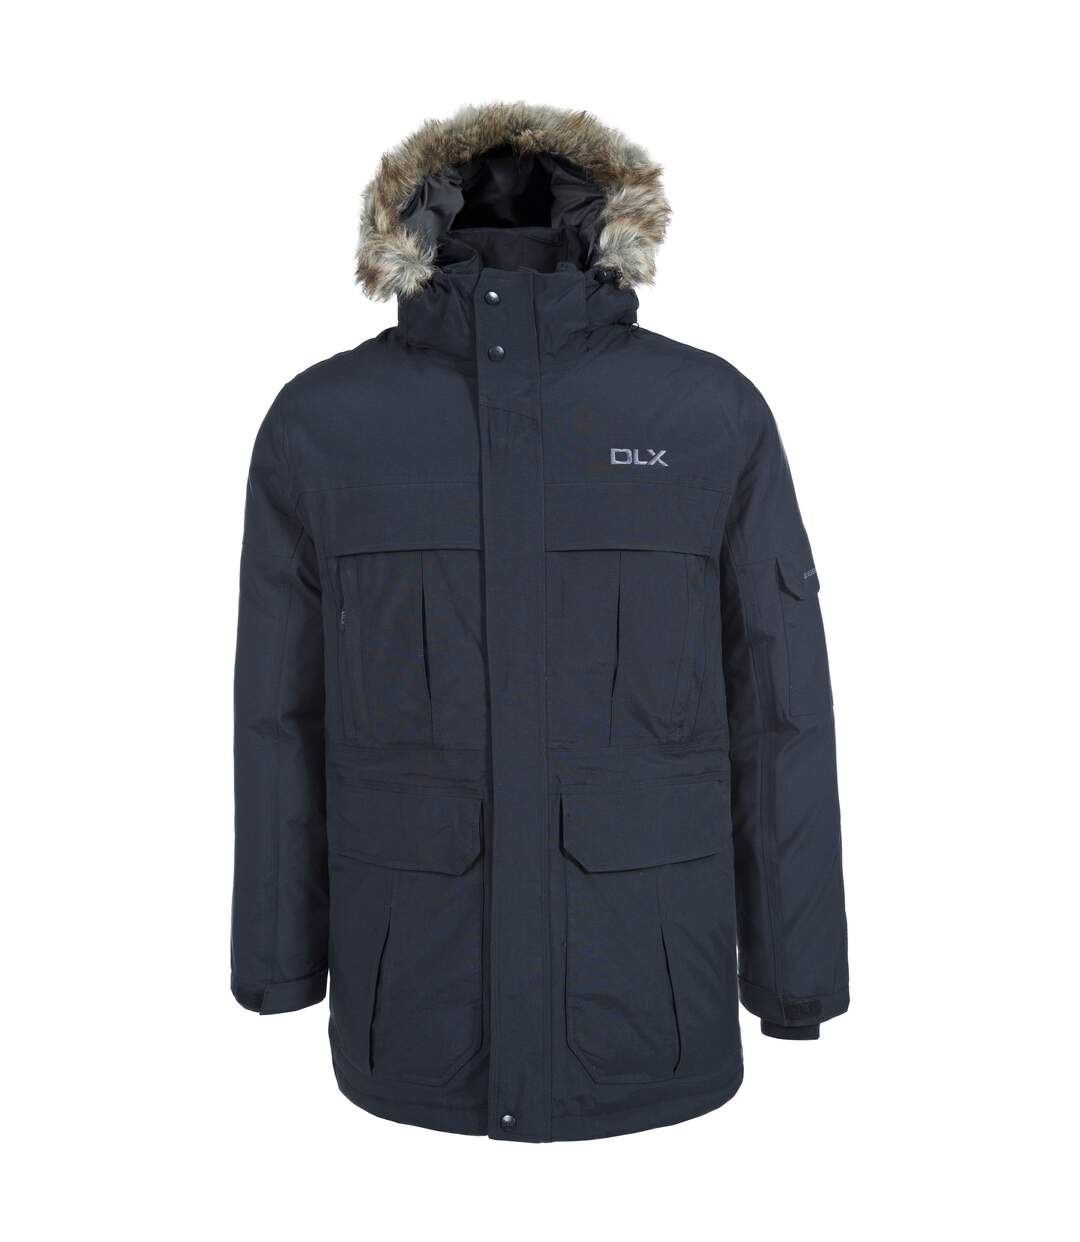 Trespass Mens Highland Waterproof Parka Jacket (Khaki) - UTTP1304